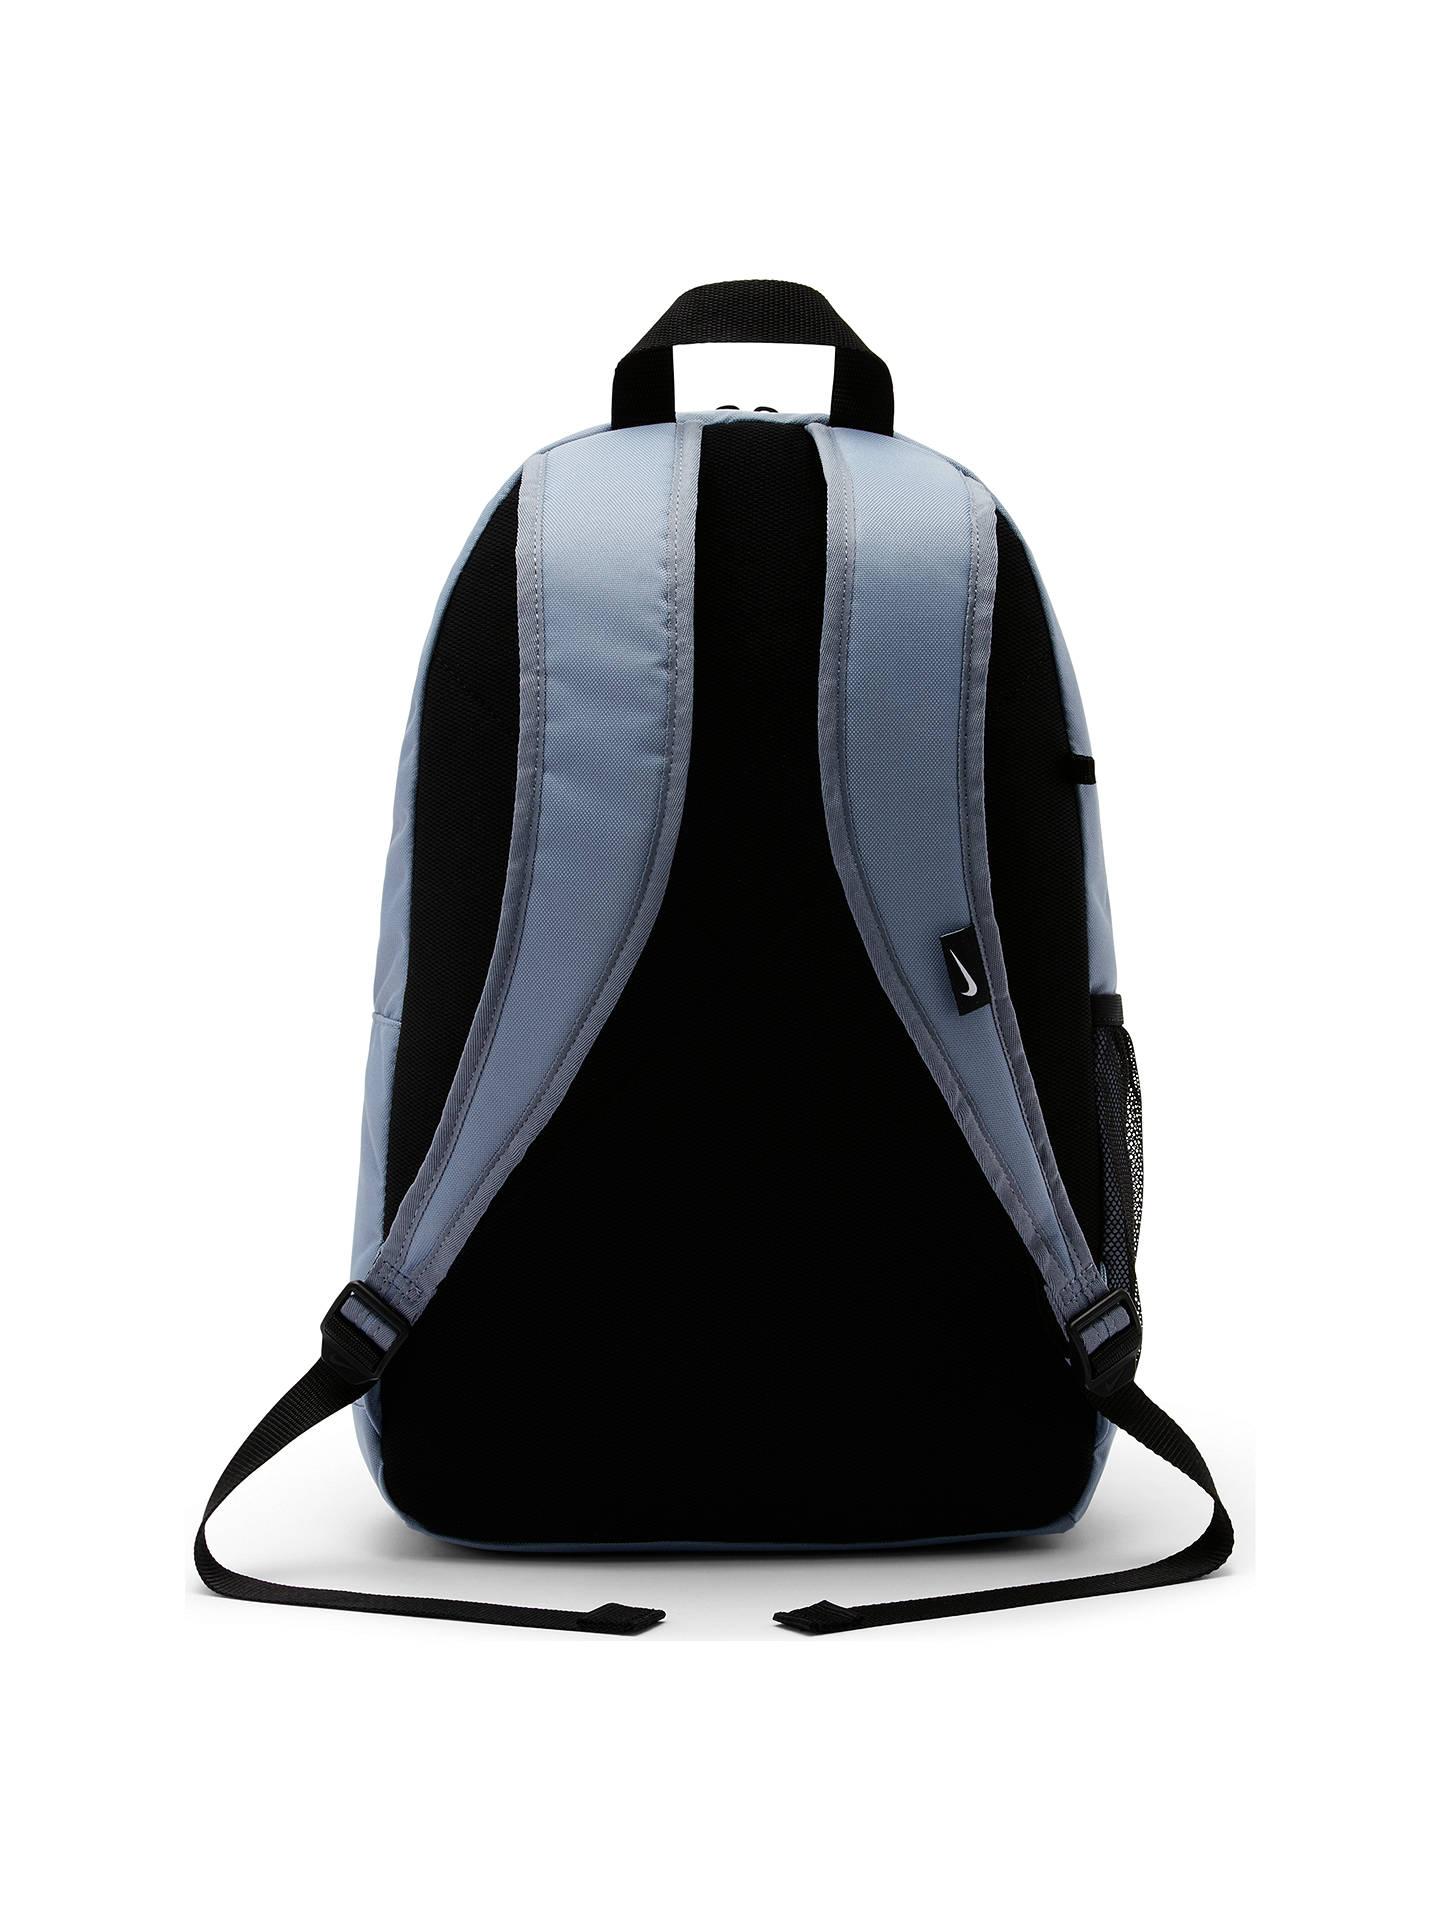 60dfbb48a0 Nike Elemental Backpack Grey And Pink- Fenix Toulouse Handball